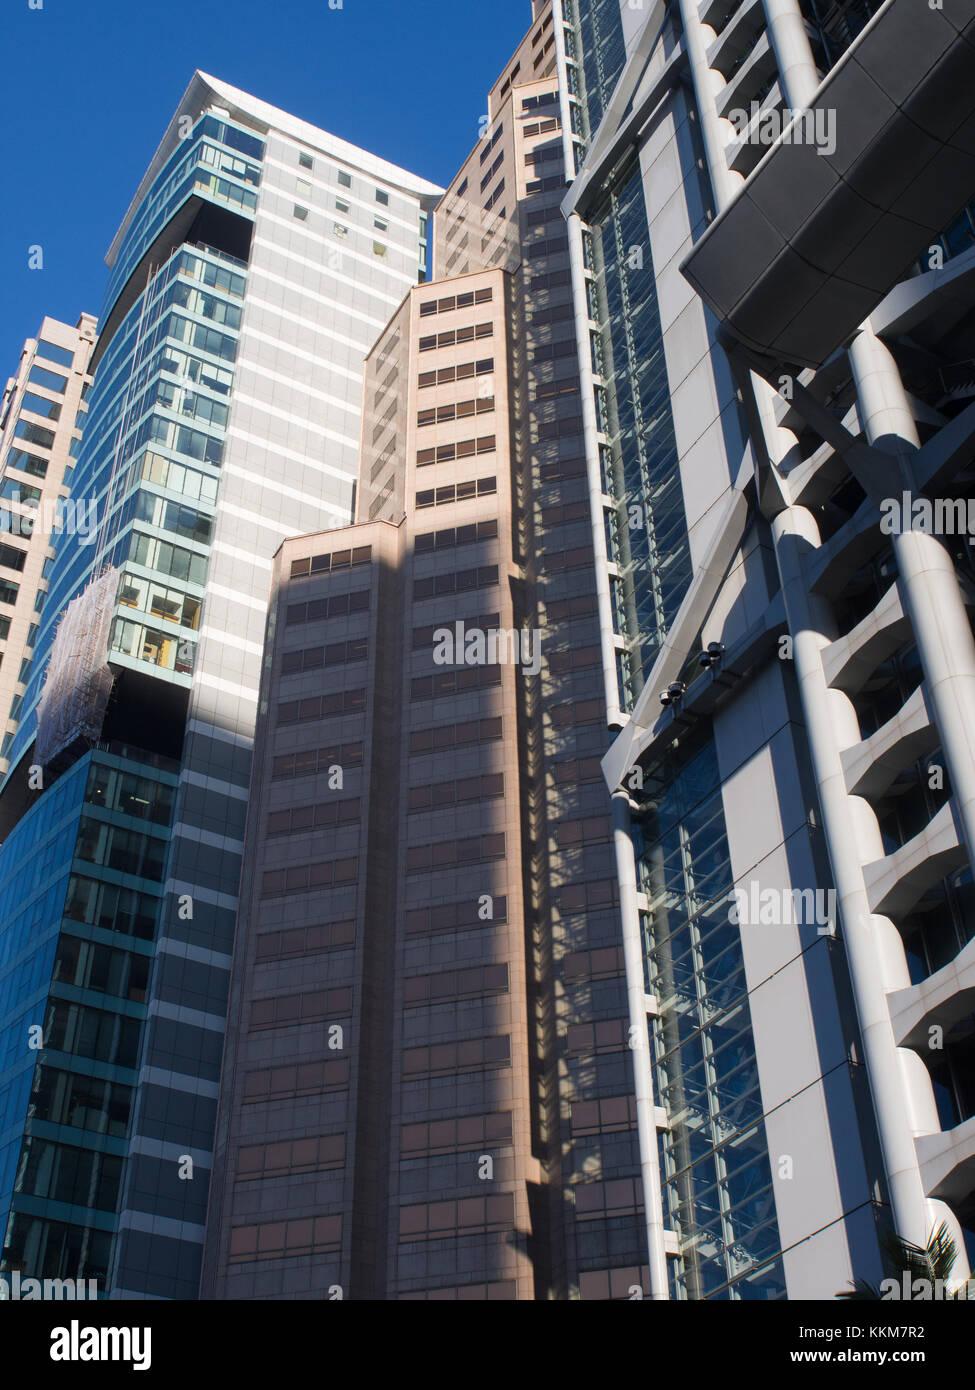 Hong Kong Office Buildings - Stock Image